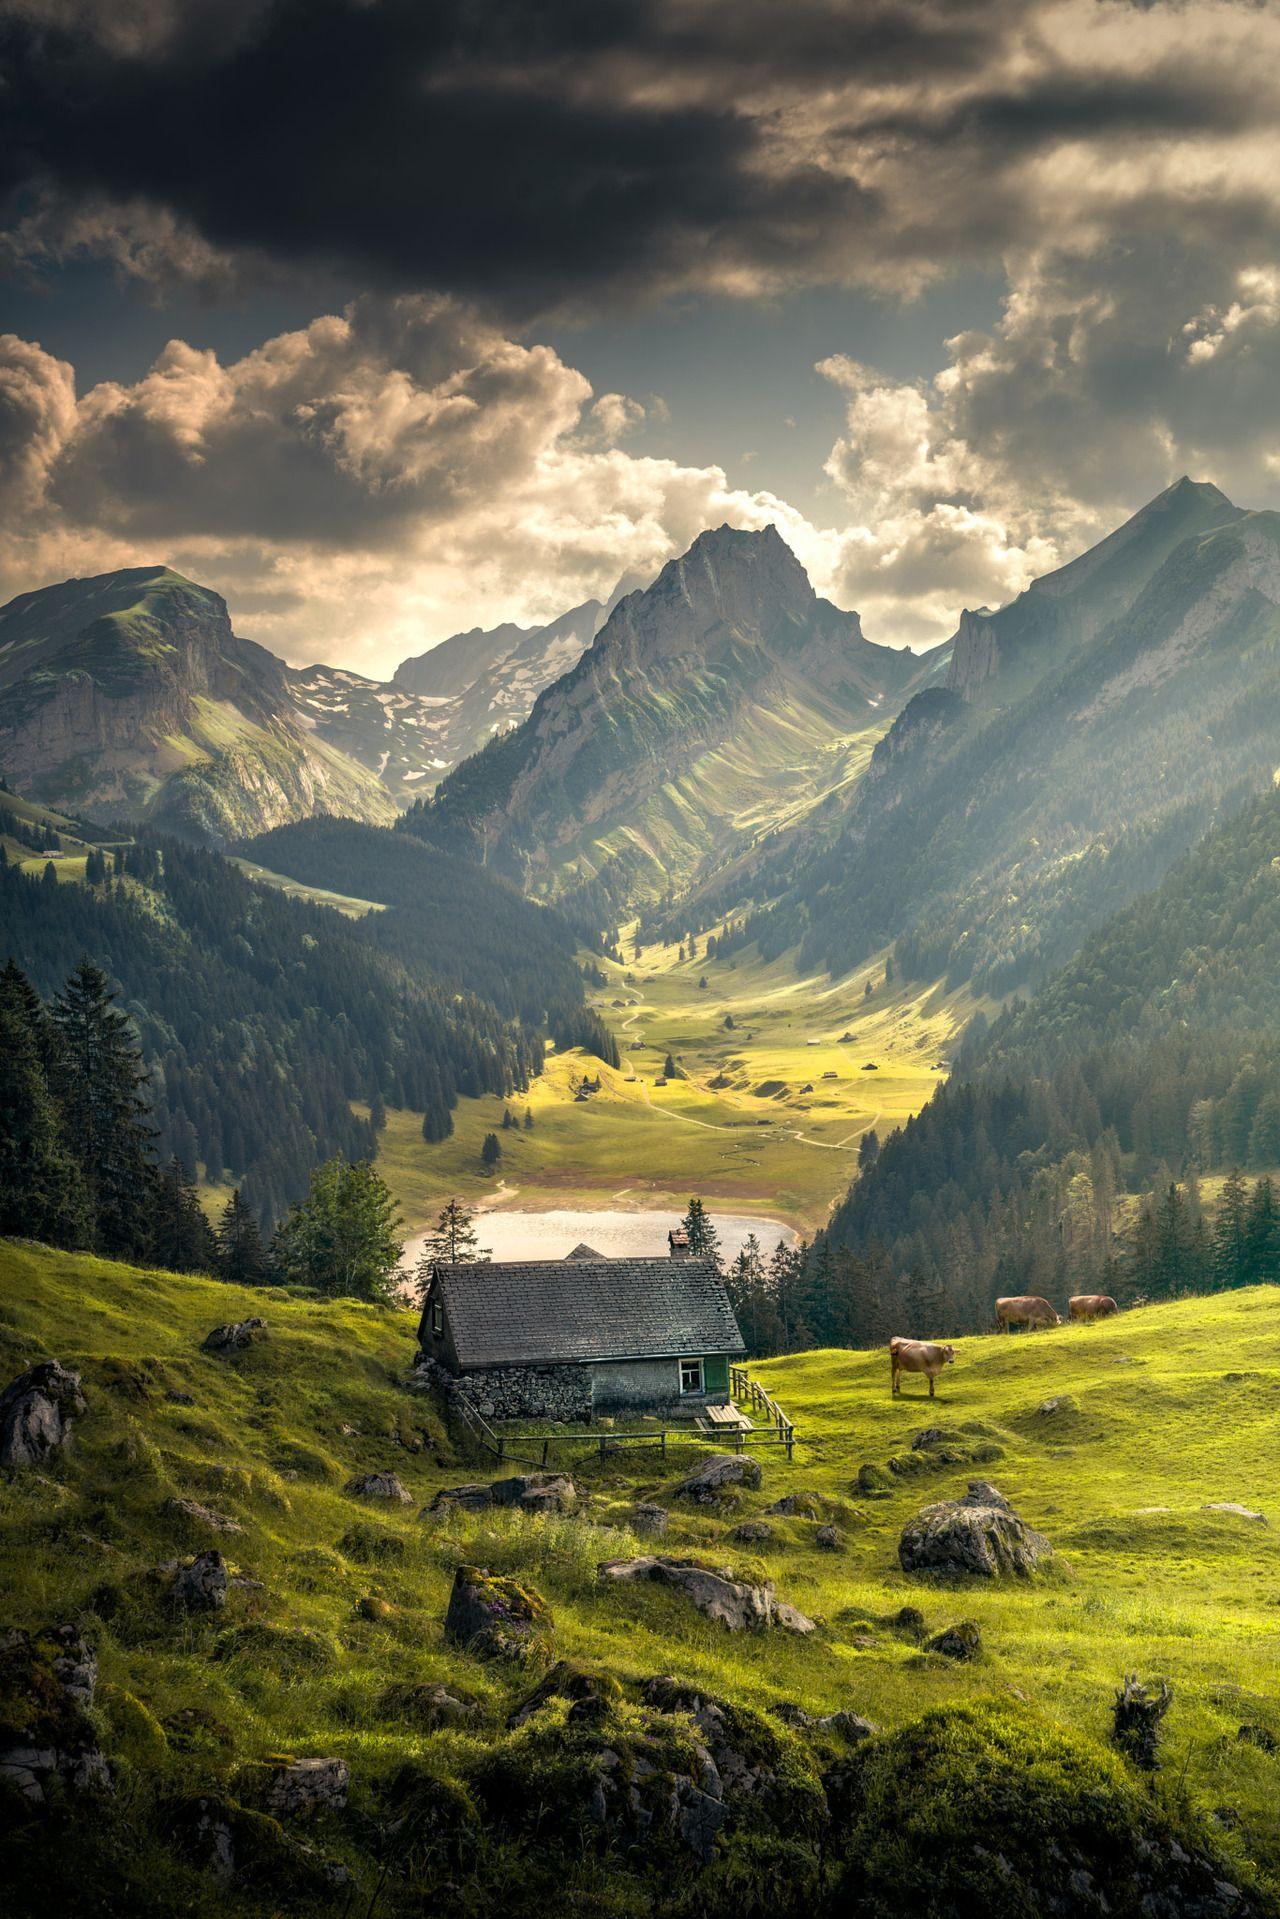 Silvaris Fairy Tale By Ilhan Eroglu Mountain Landscape Photography Beautiful Landscape Photography Landscape Photography